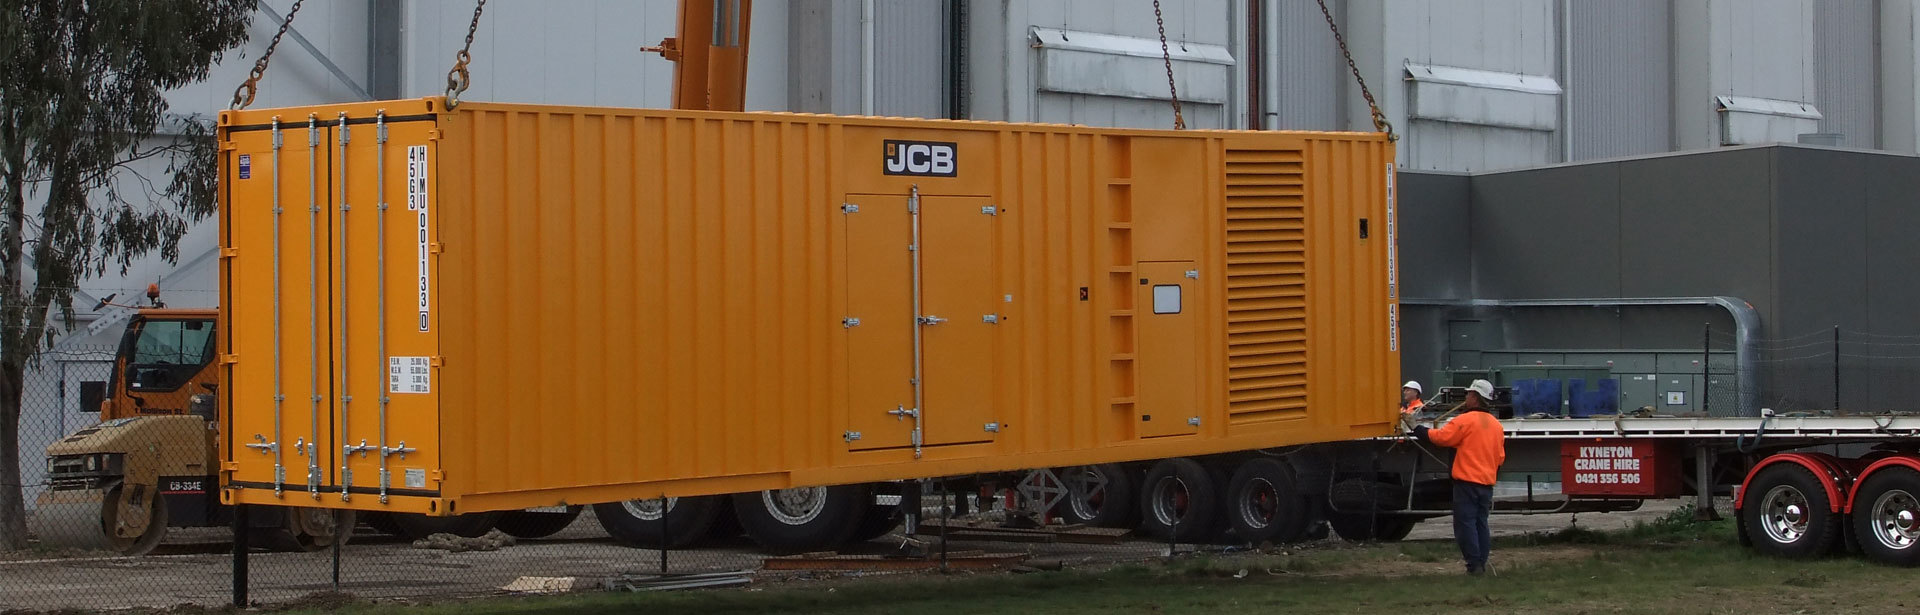 Image of a 800-2500 kVA Perkins